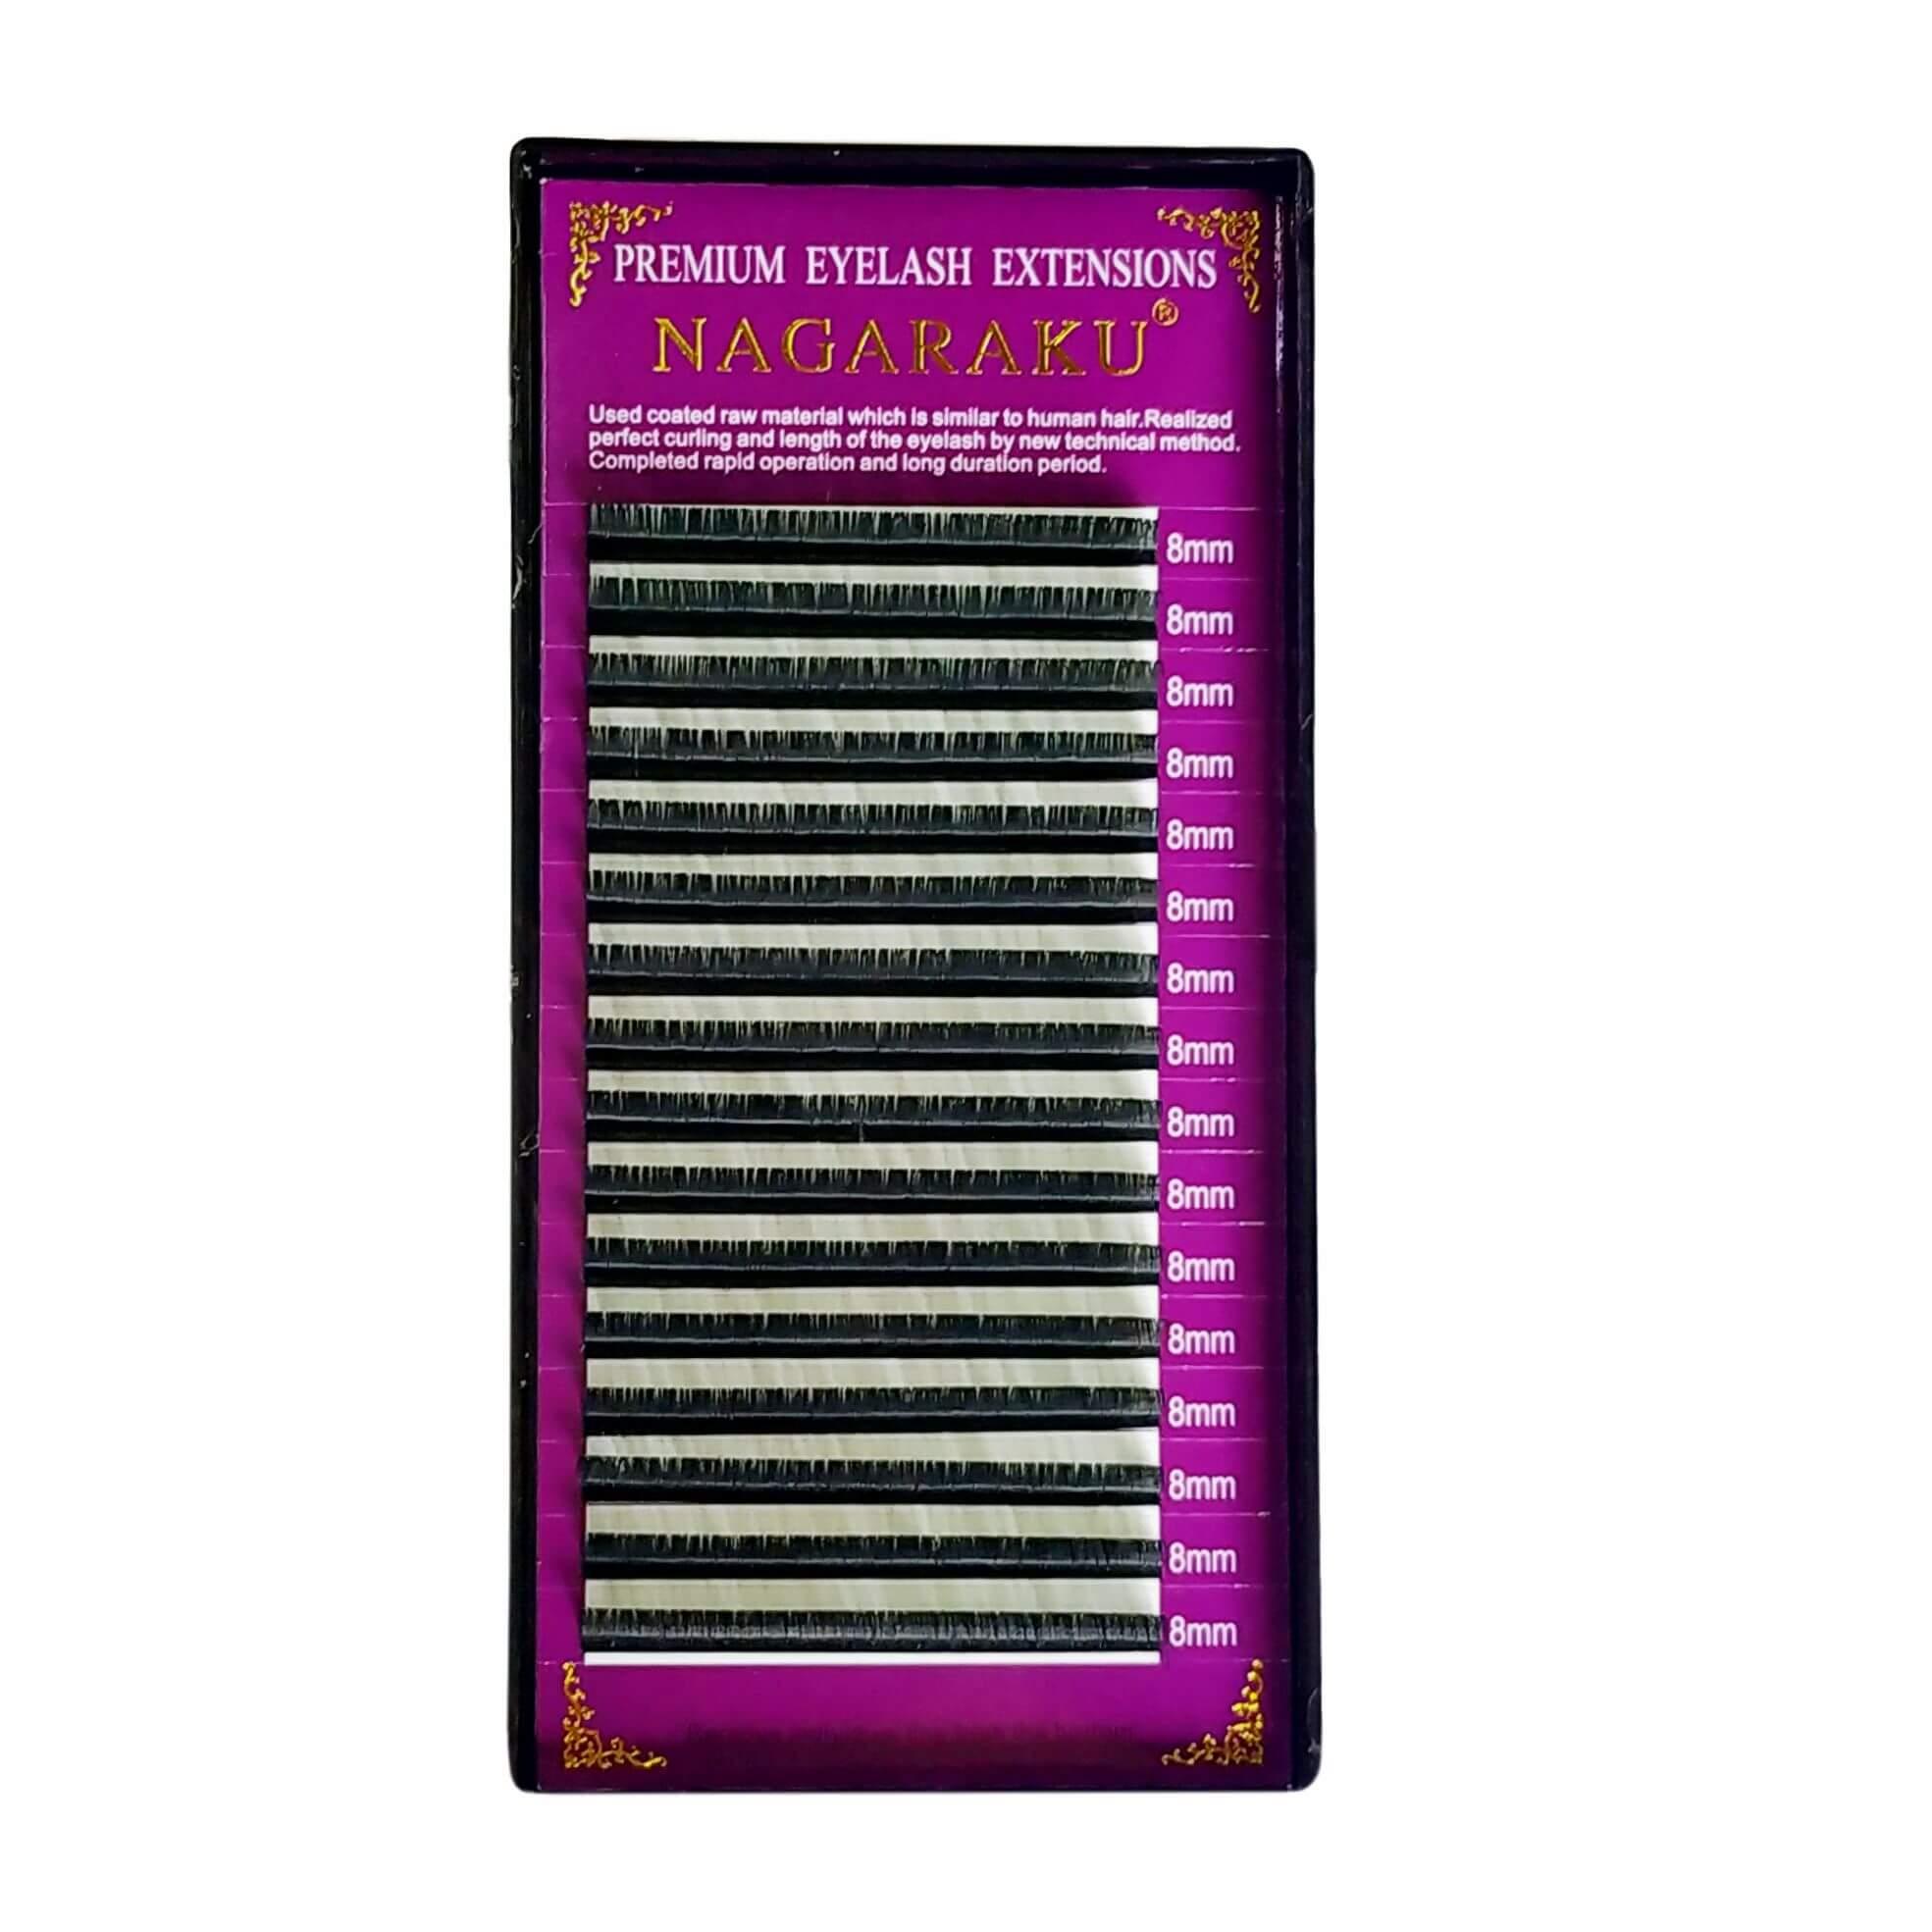 Cílios Nagaraku Premium Volume Russo 8mm 0.07D